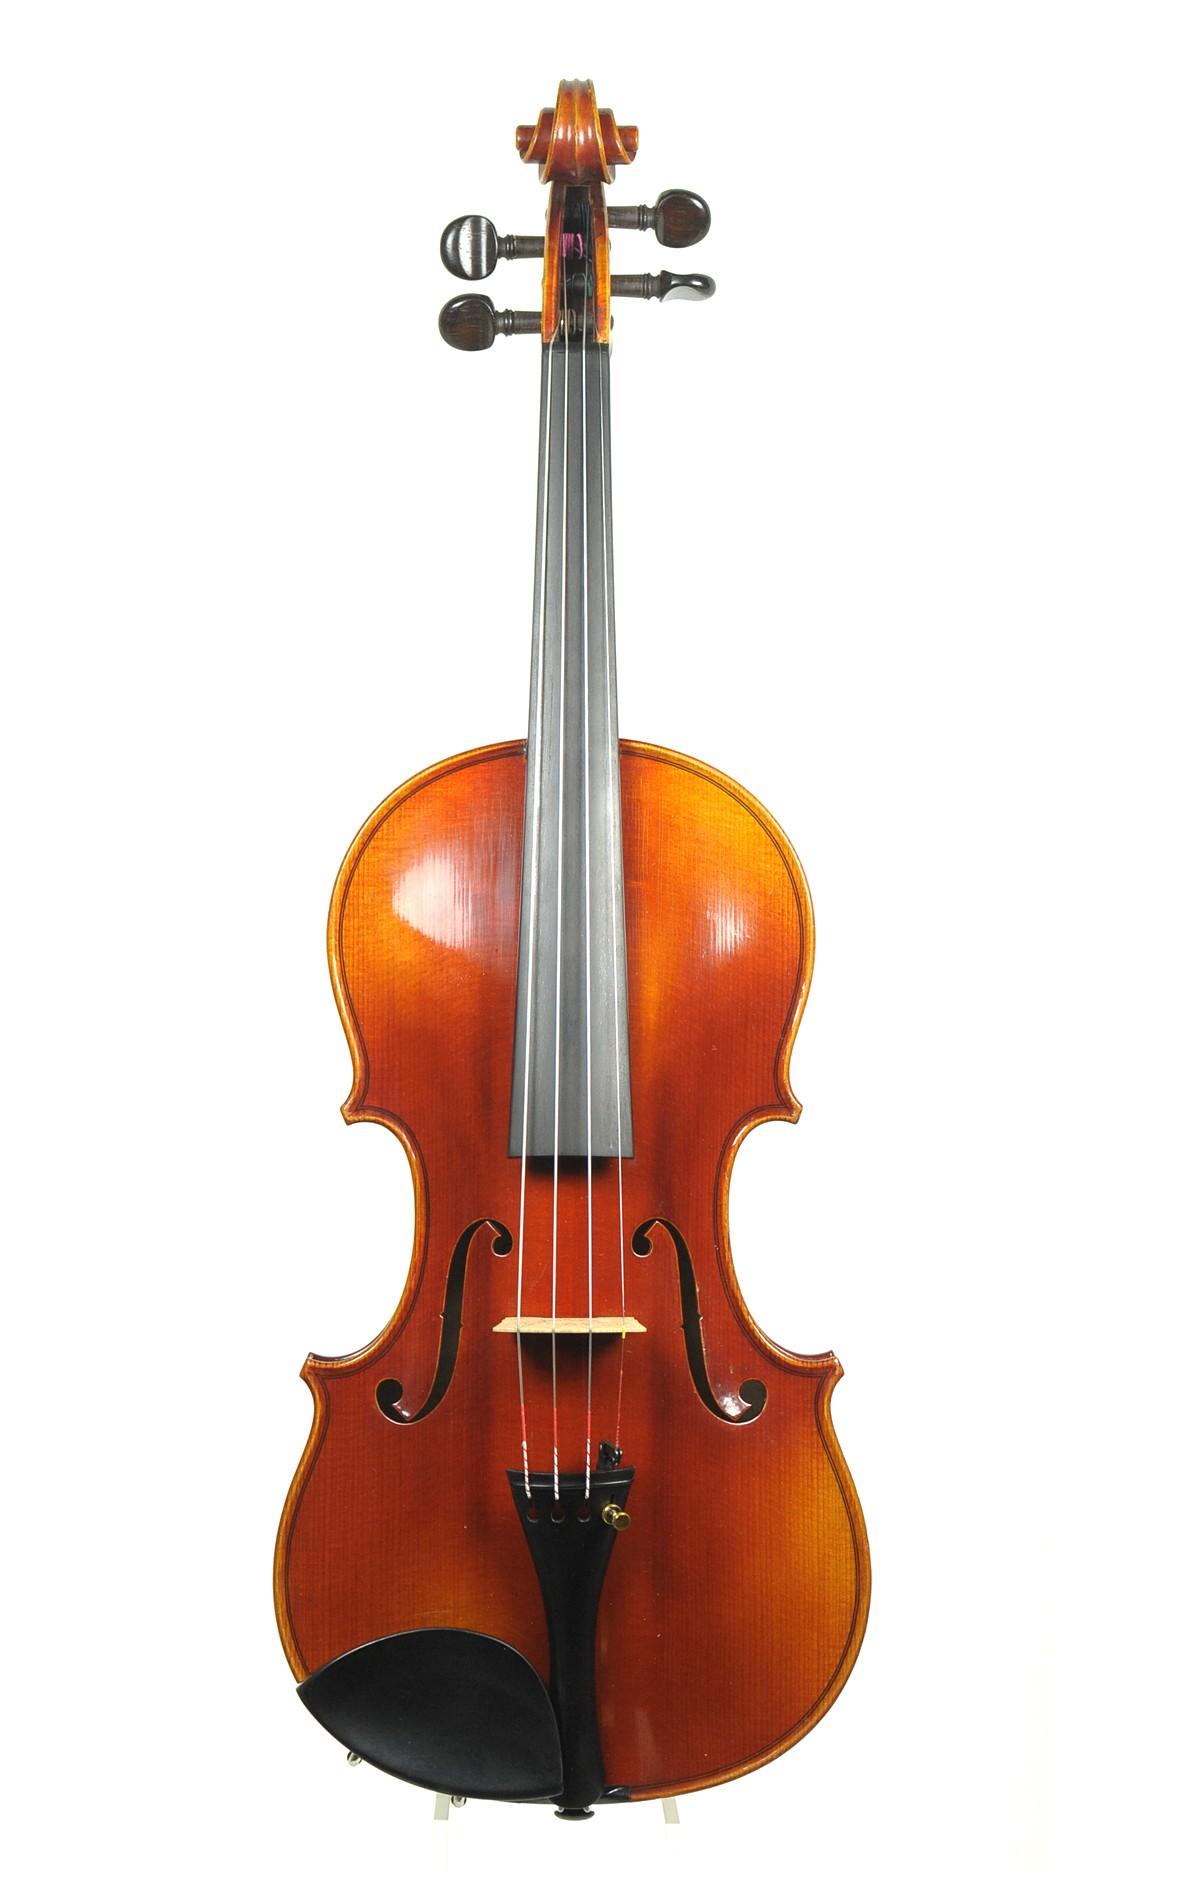 Atelier Charles Le Lyonnais, French violin, Nantes 1939